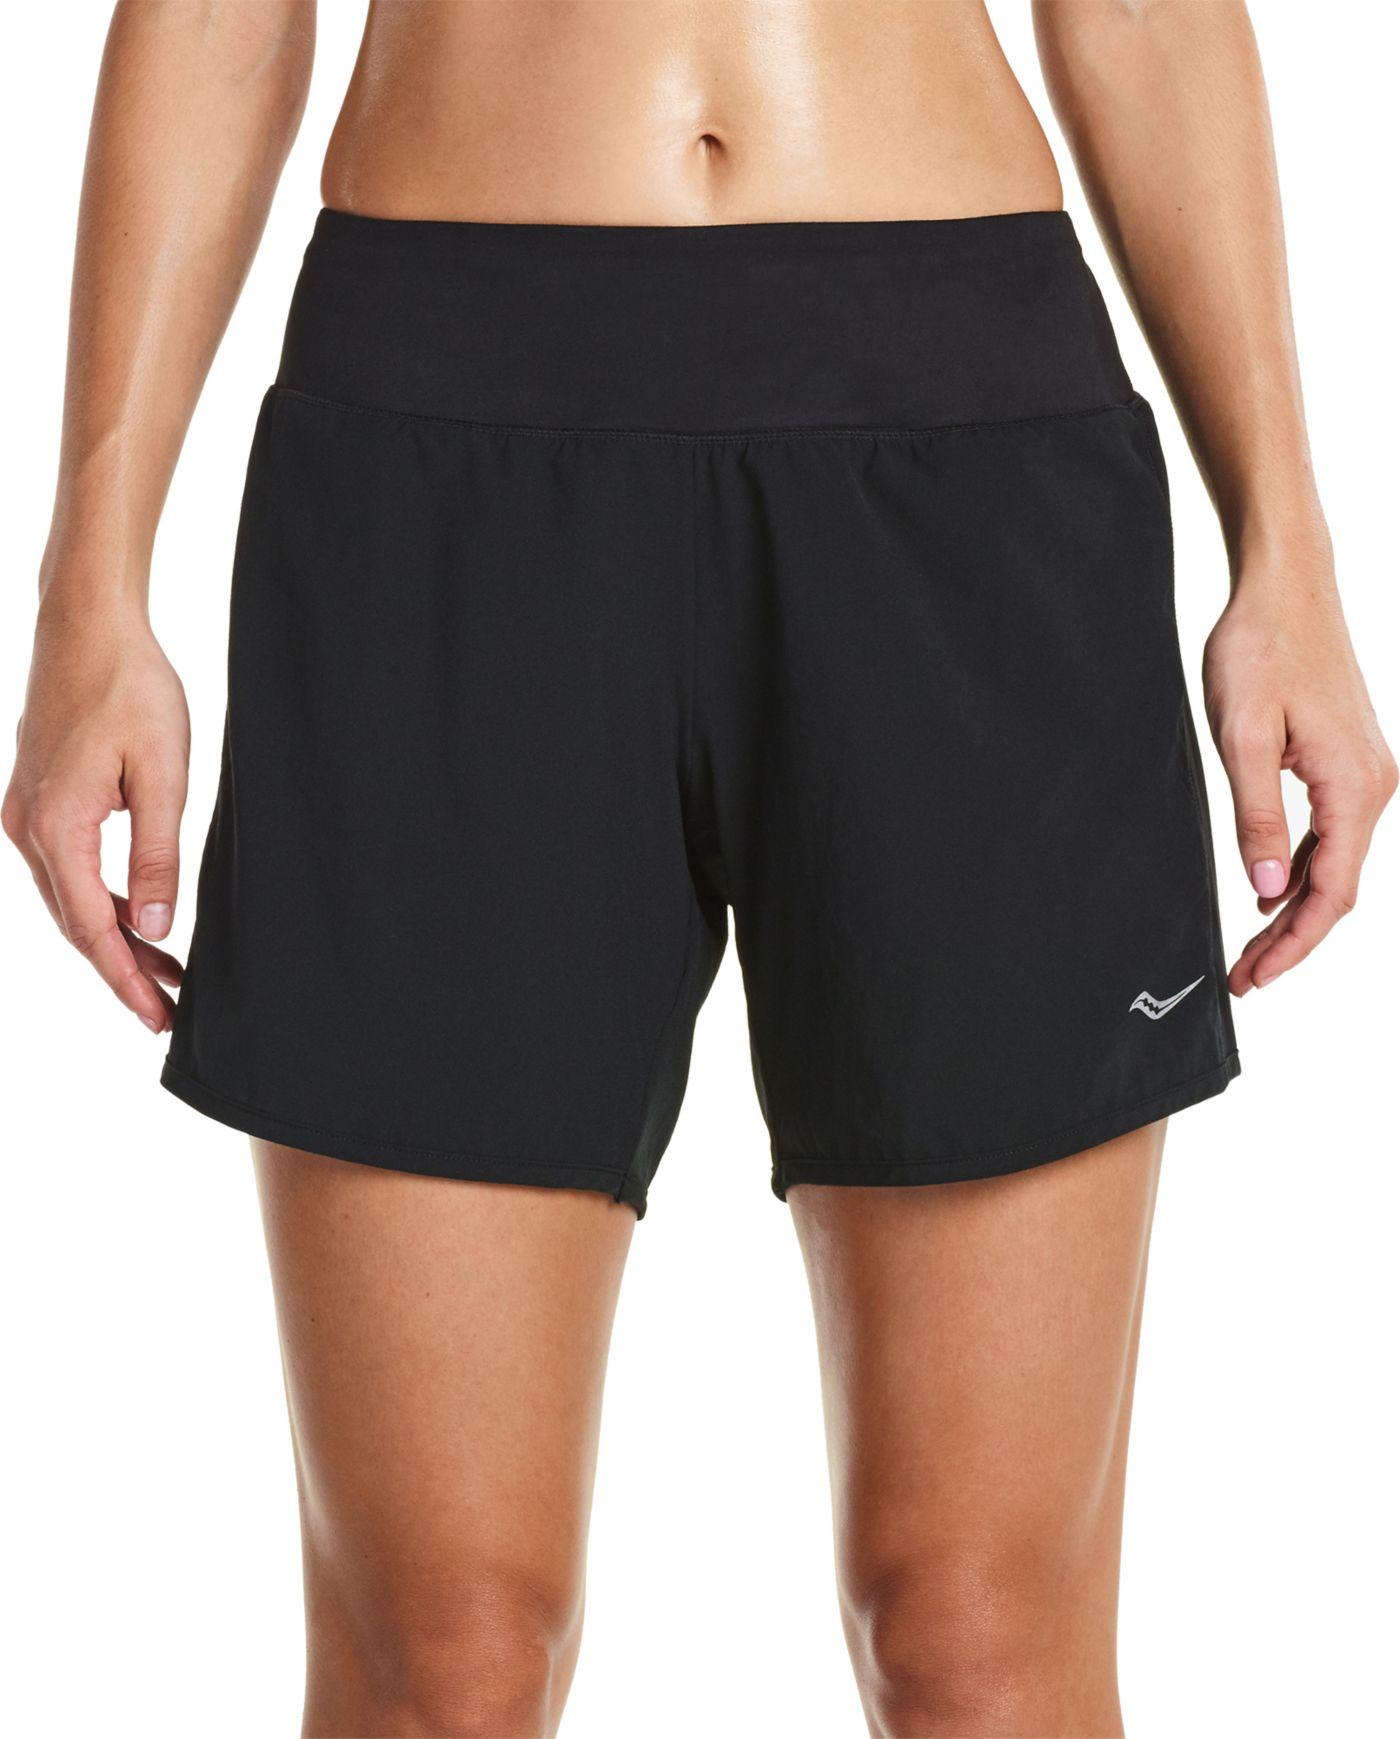 Saucony Women's Lux Running Shorts